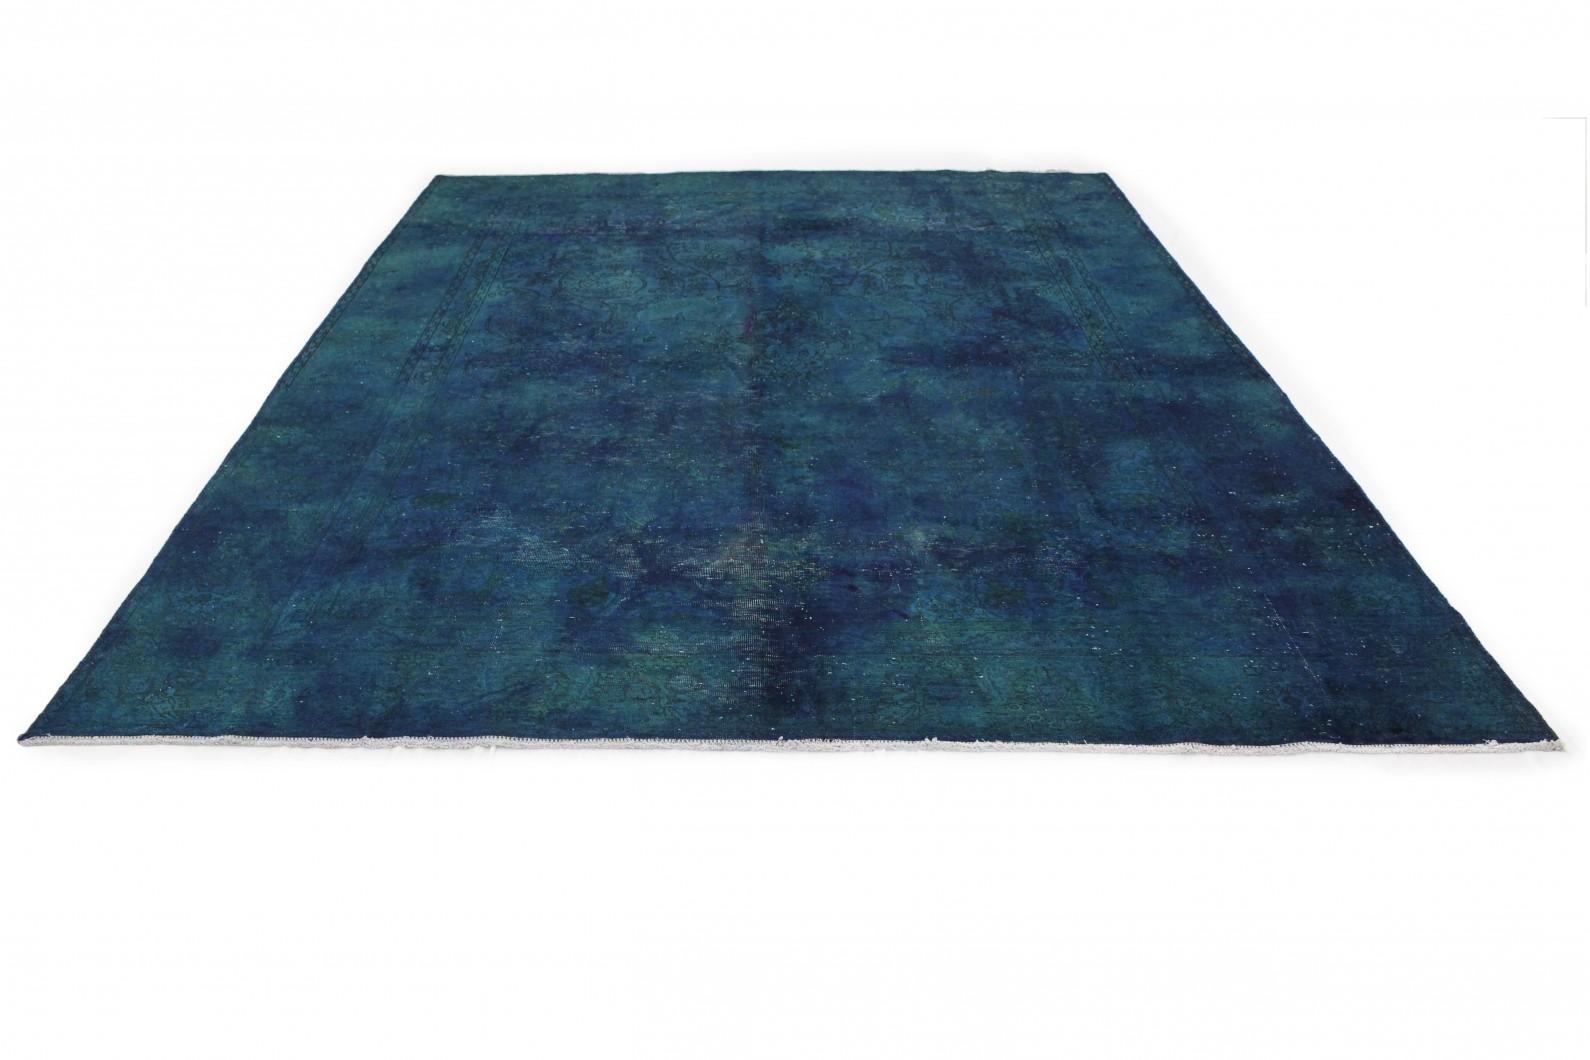 vintage teppich blau t rkis in 390x280cm 1001 3060 bei. Black Bedroom Furniture Sets. Home Design Ideas